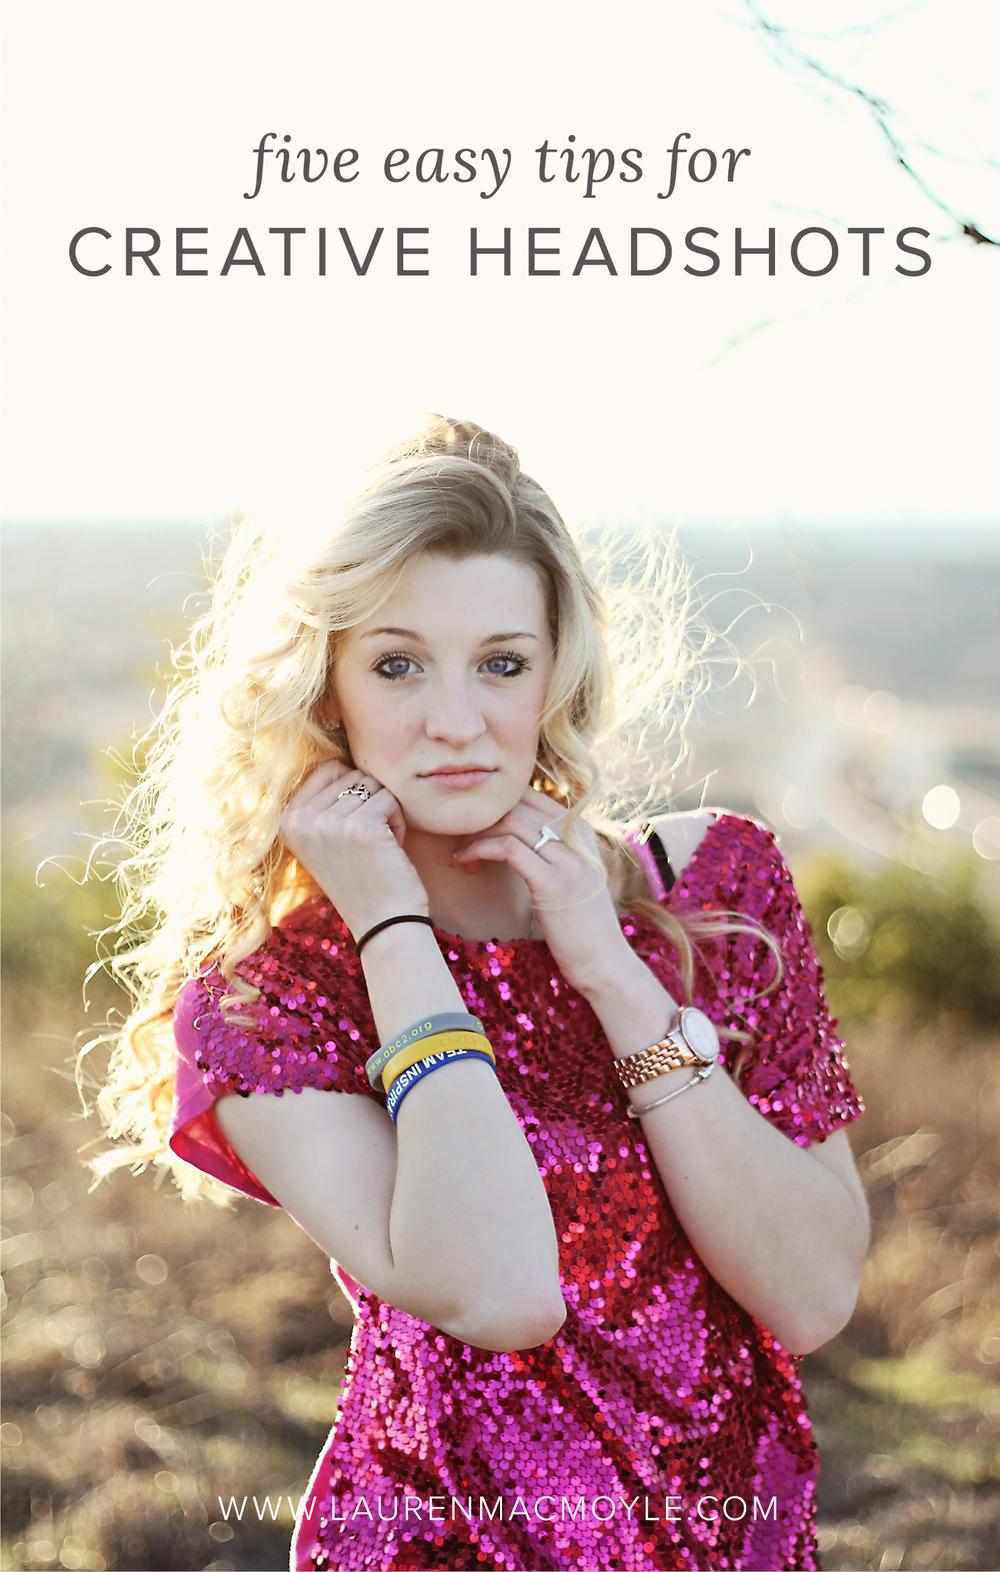 Five Easy Tips for Creative Headshots | Lauren MacMoyle | Portrait Photography